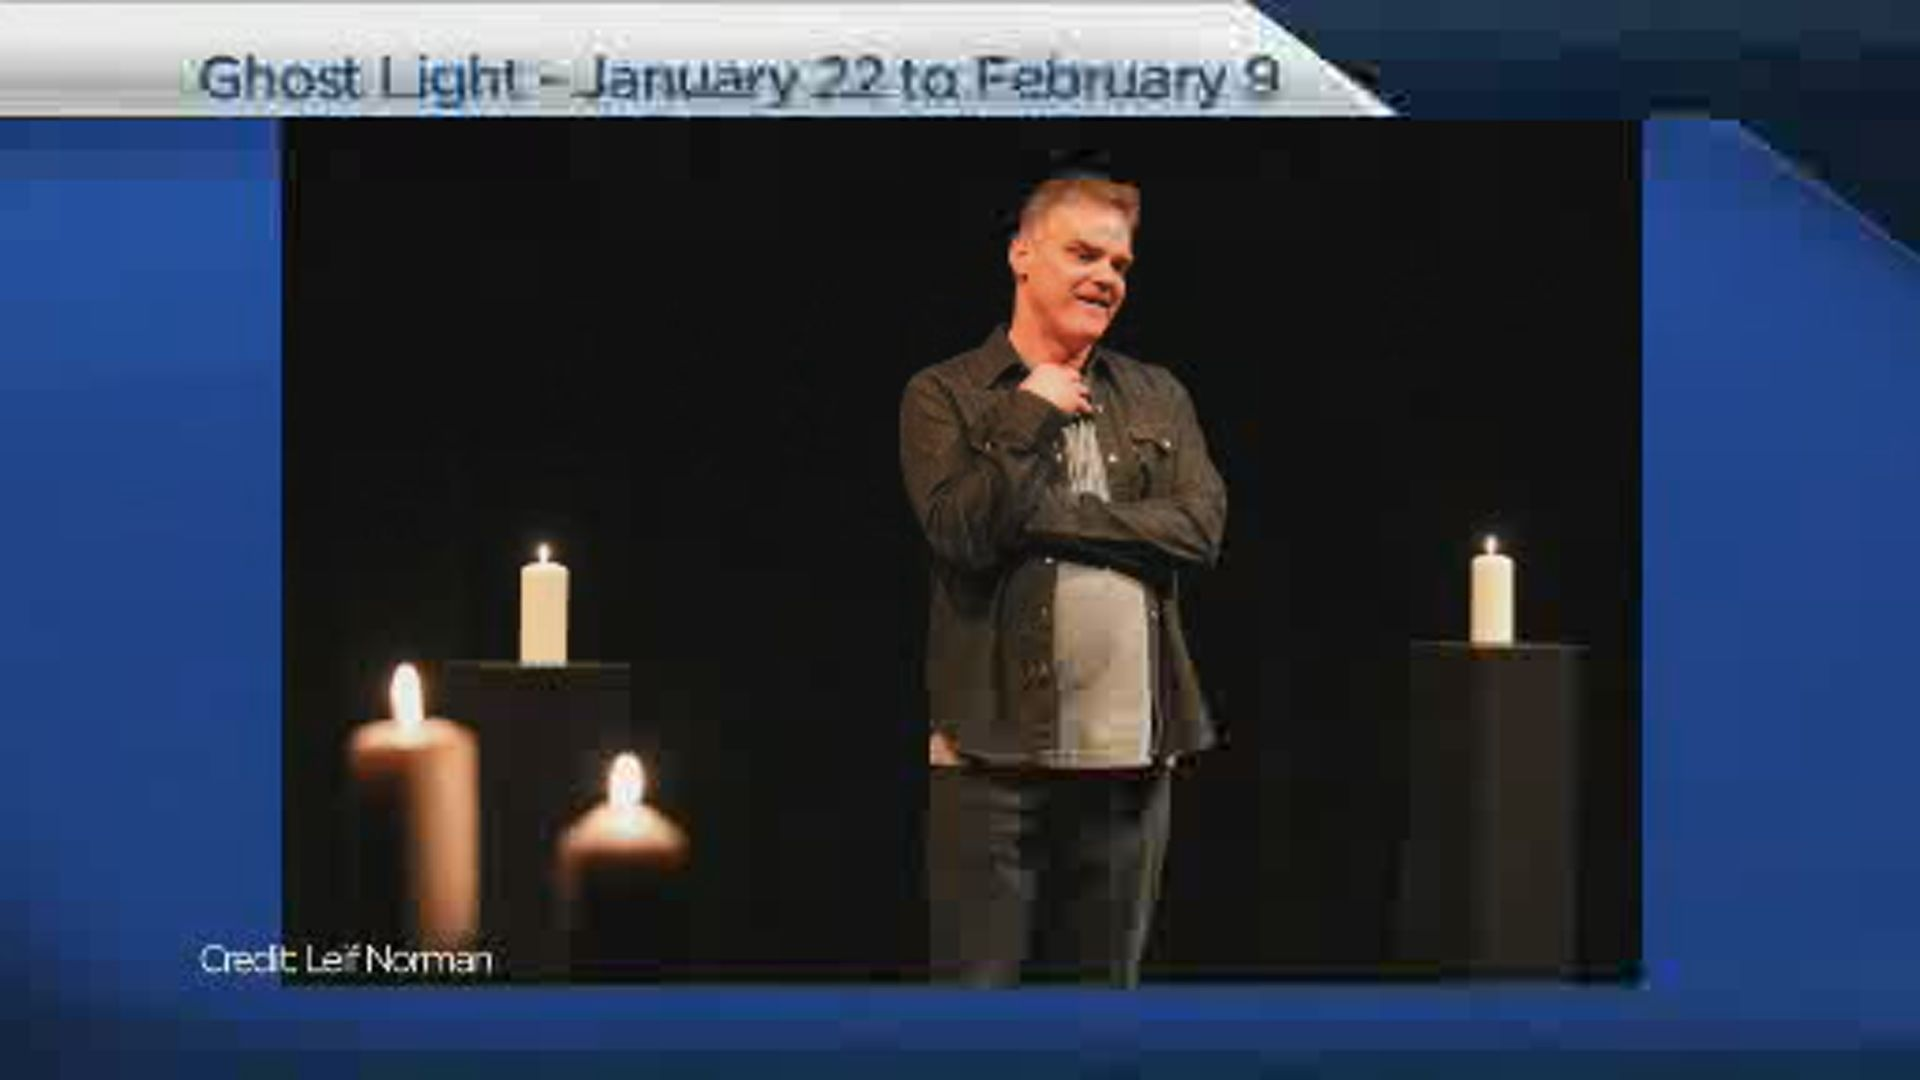 Ghost Light runs Jan 22 to Feb 9 at Prairie Theatre Exchange